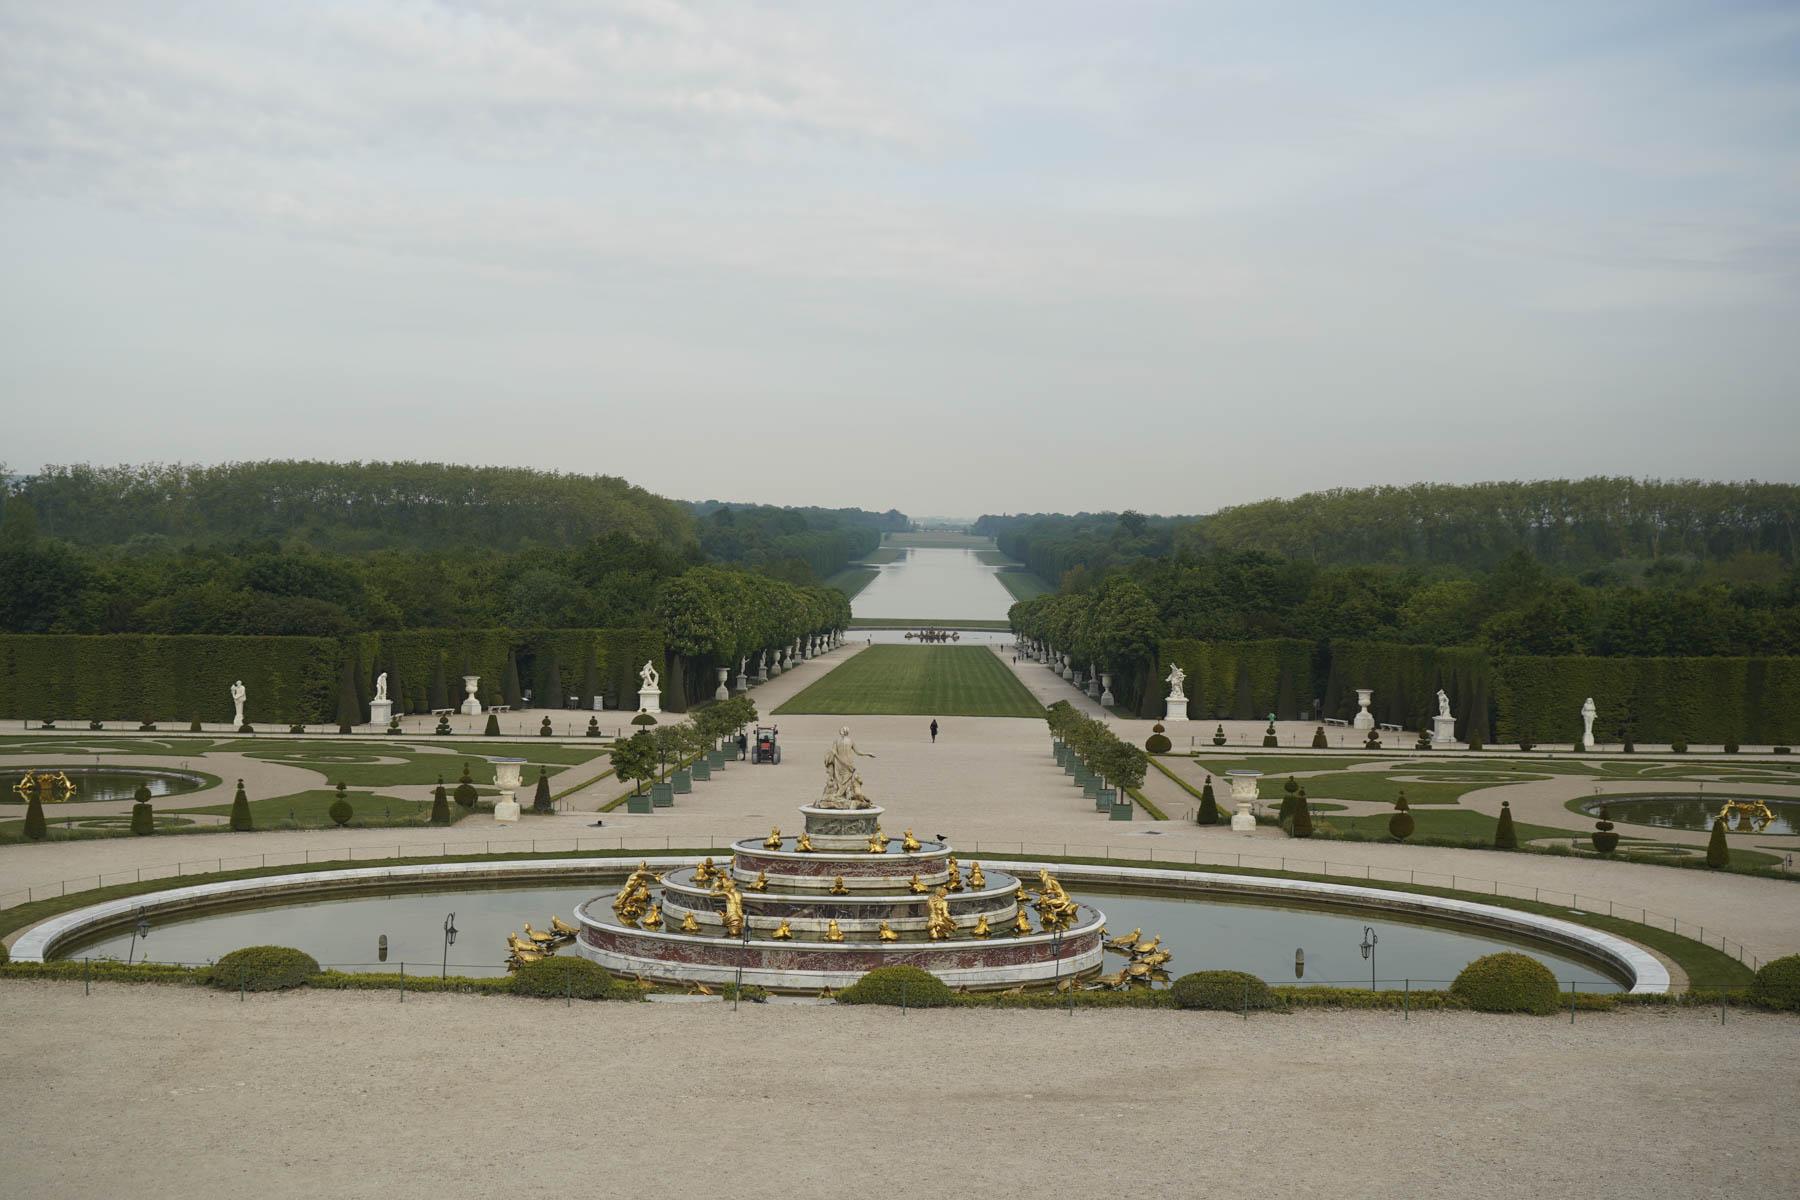 Ep 2, 3 - PARIS/VERSAILLES